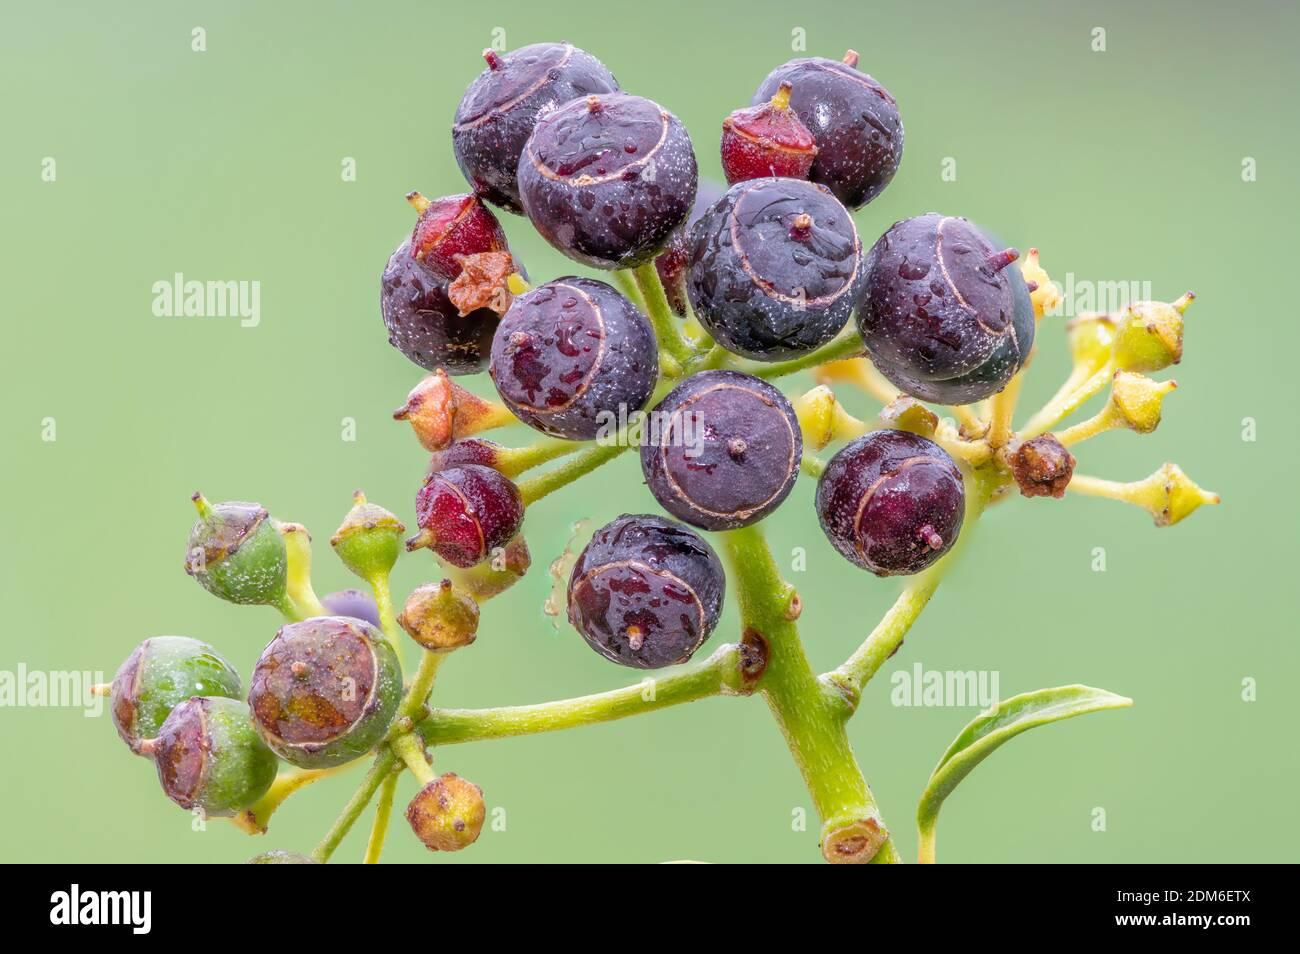 Nahaufnahme von reifen Efeu (hedera Helix) Beeren Stockfoto